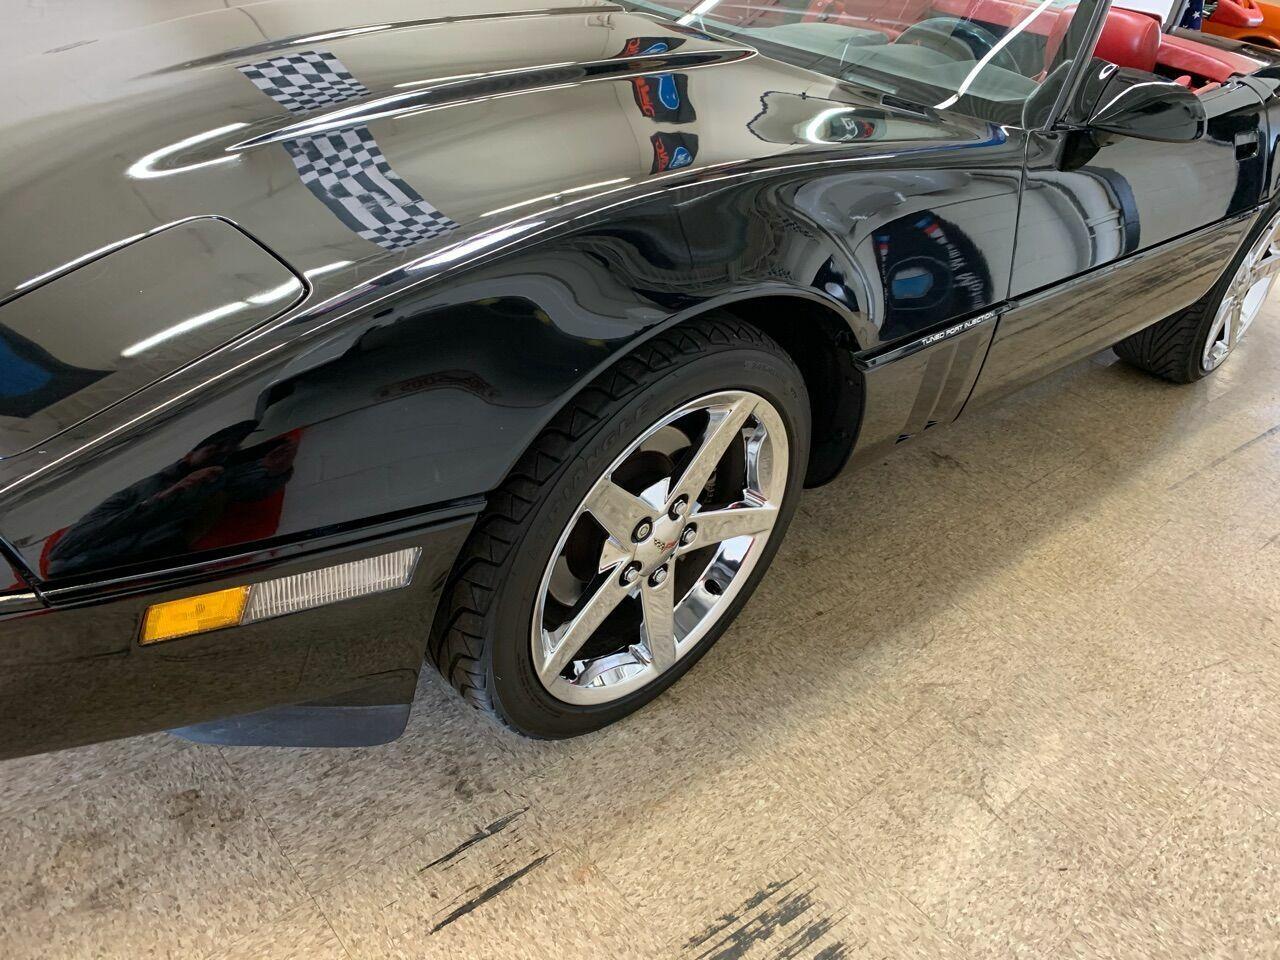 1990 Black Chevrolet Corvette Convertible    C4 Corvette Photo 10